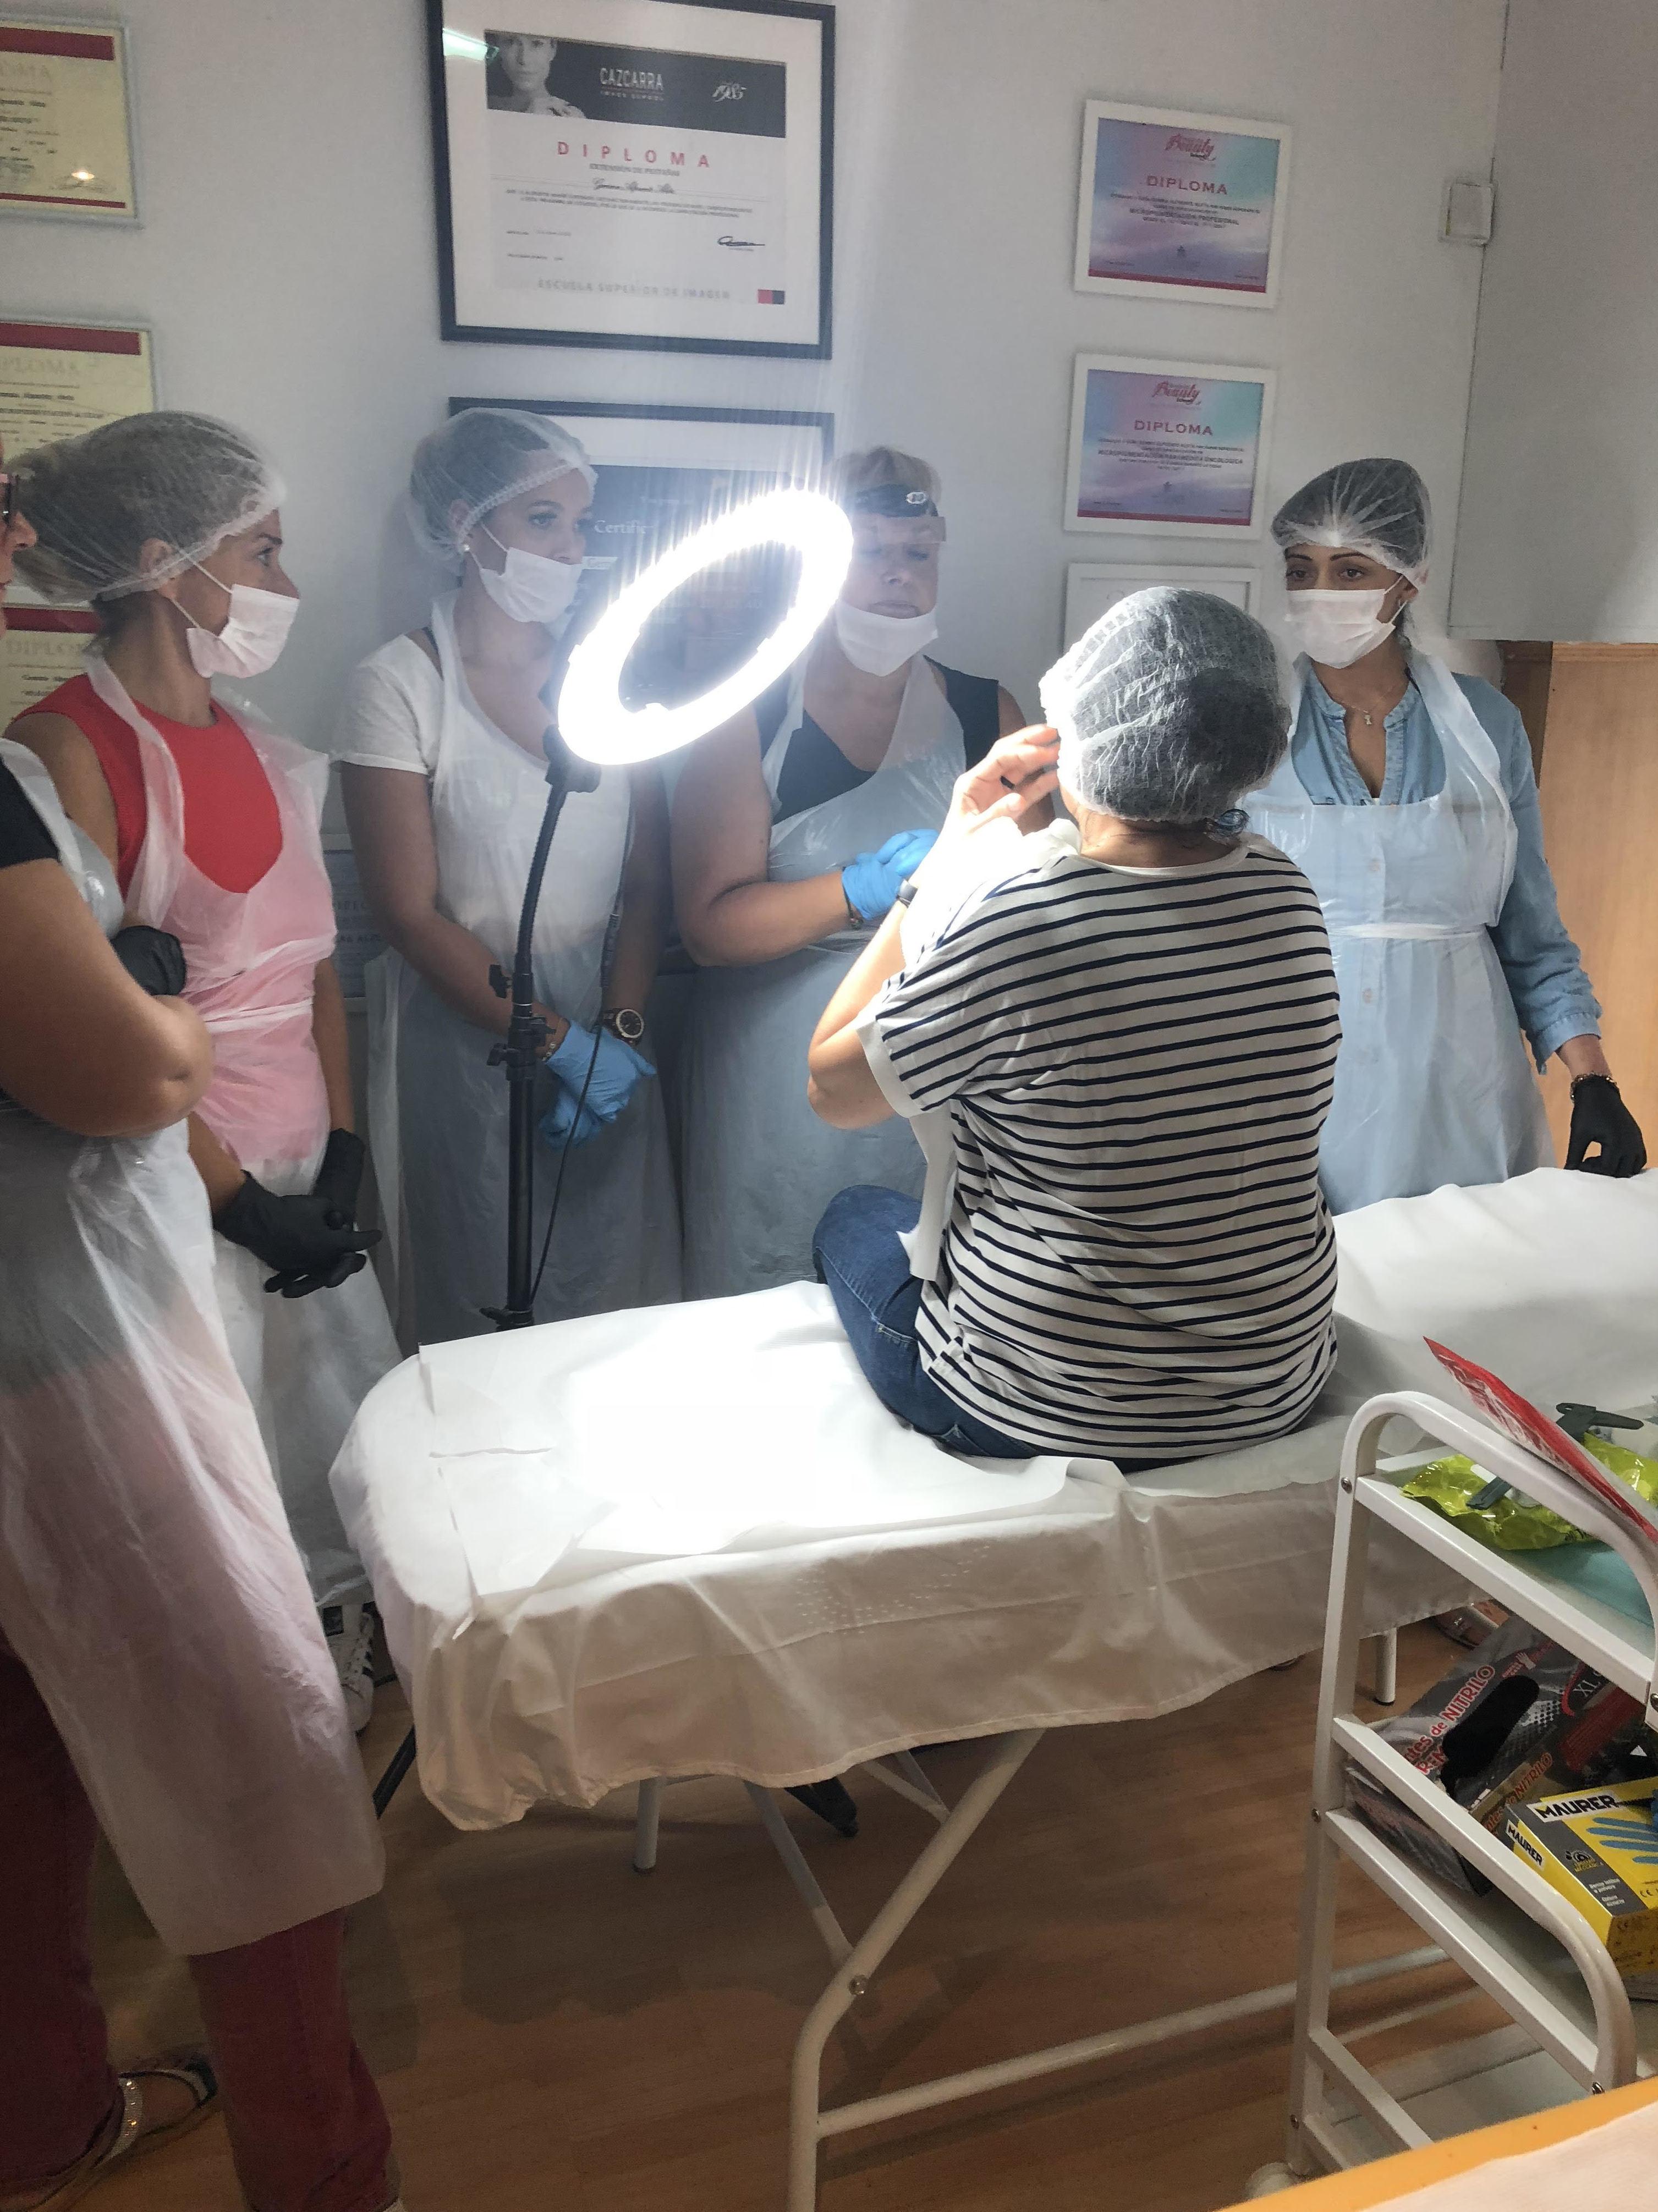 Foto 12 de Centros de estética en Zaragoza | Gemma Beauty Bar